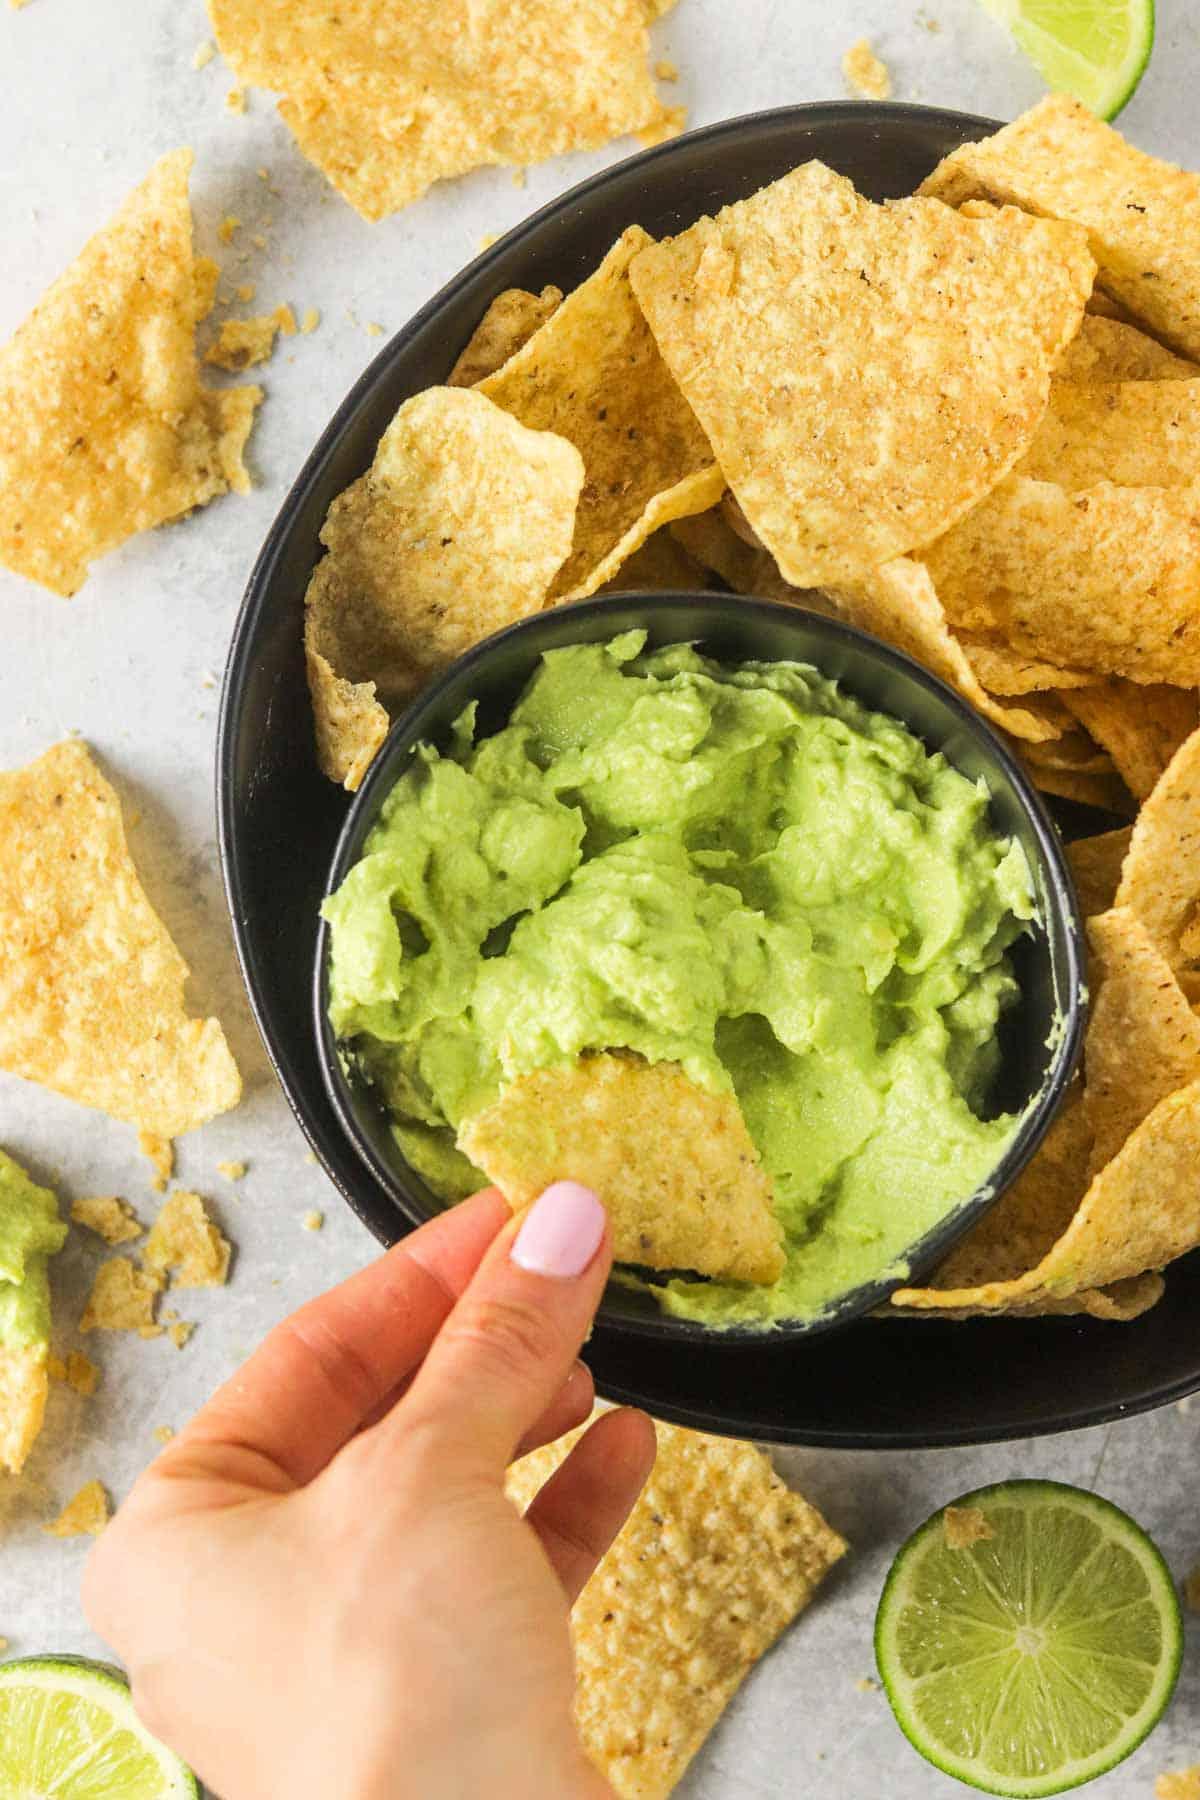 Dipping a chip into a bowl of avocado lime crema